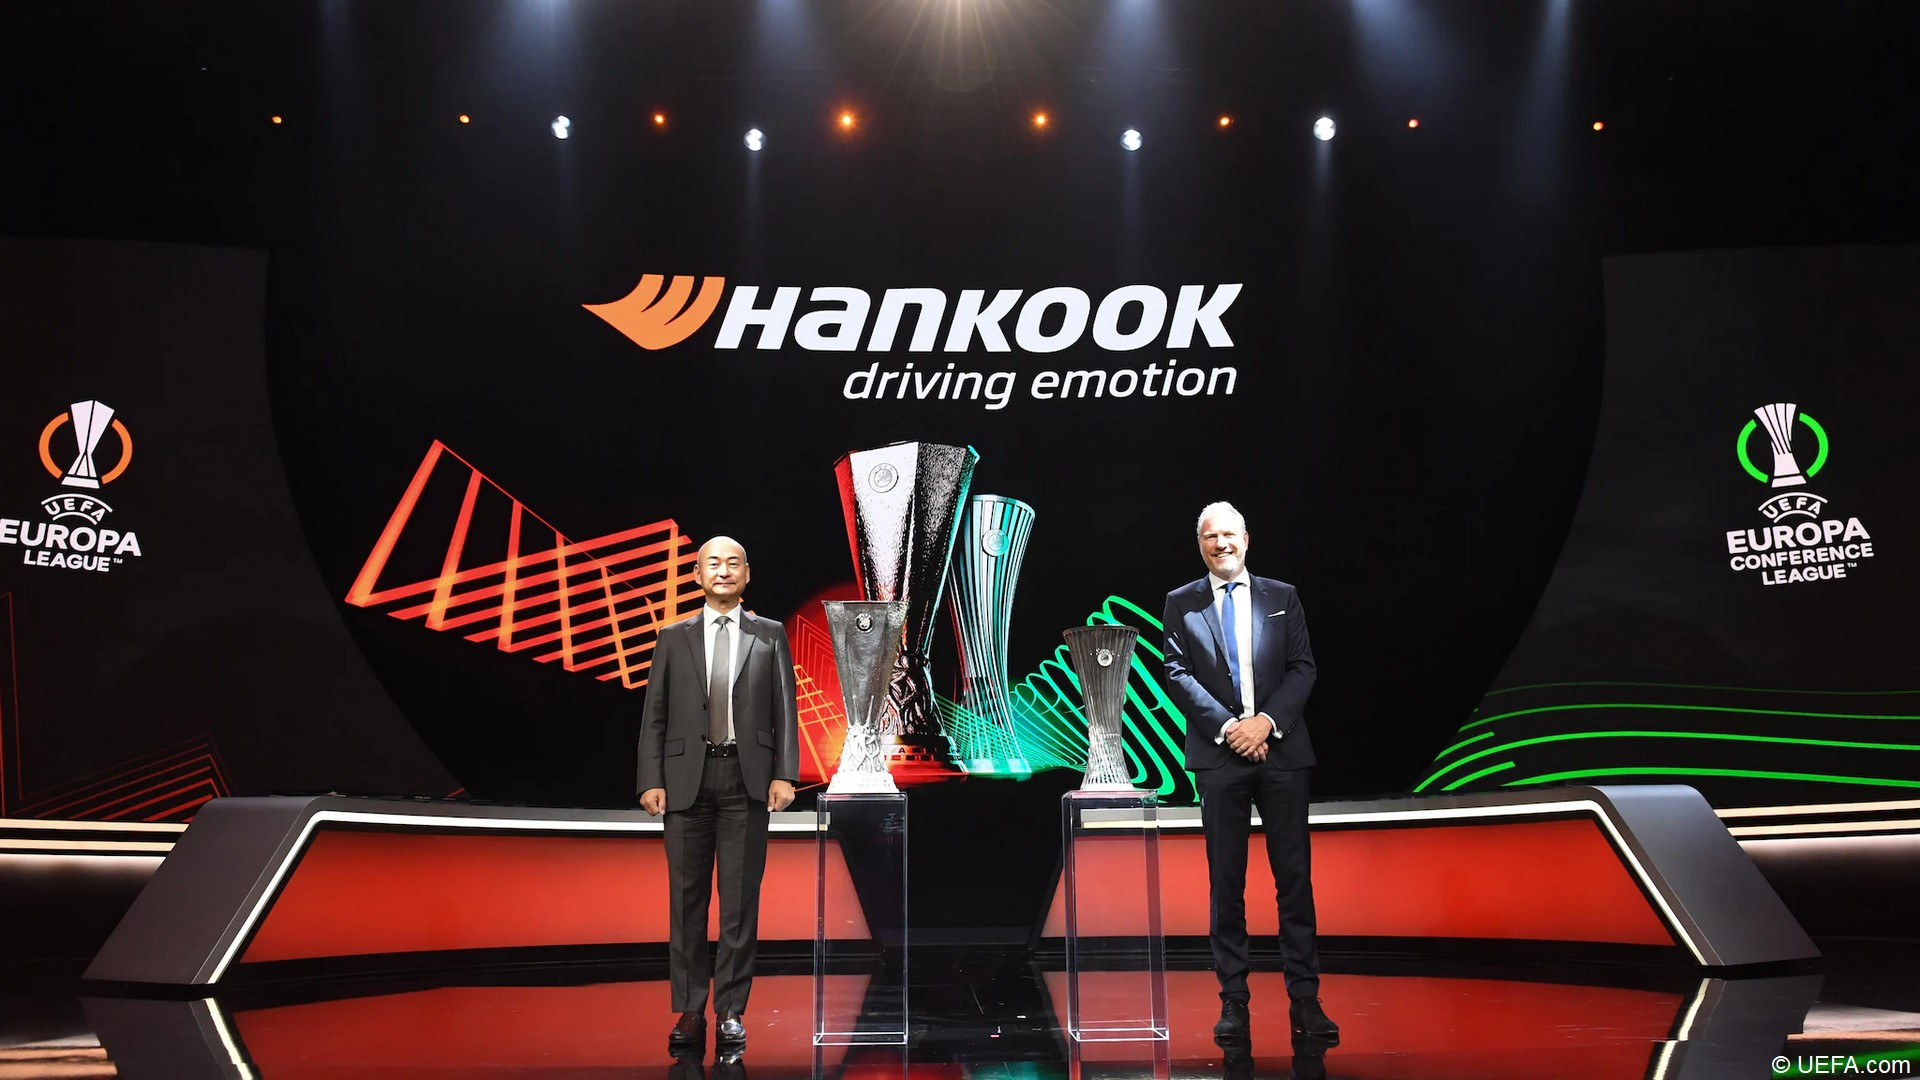 Hankook x UEFA (football) 2021